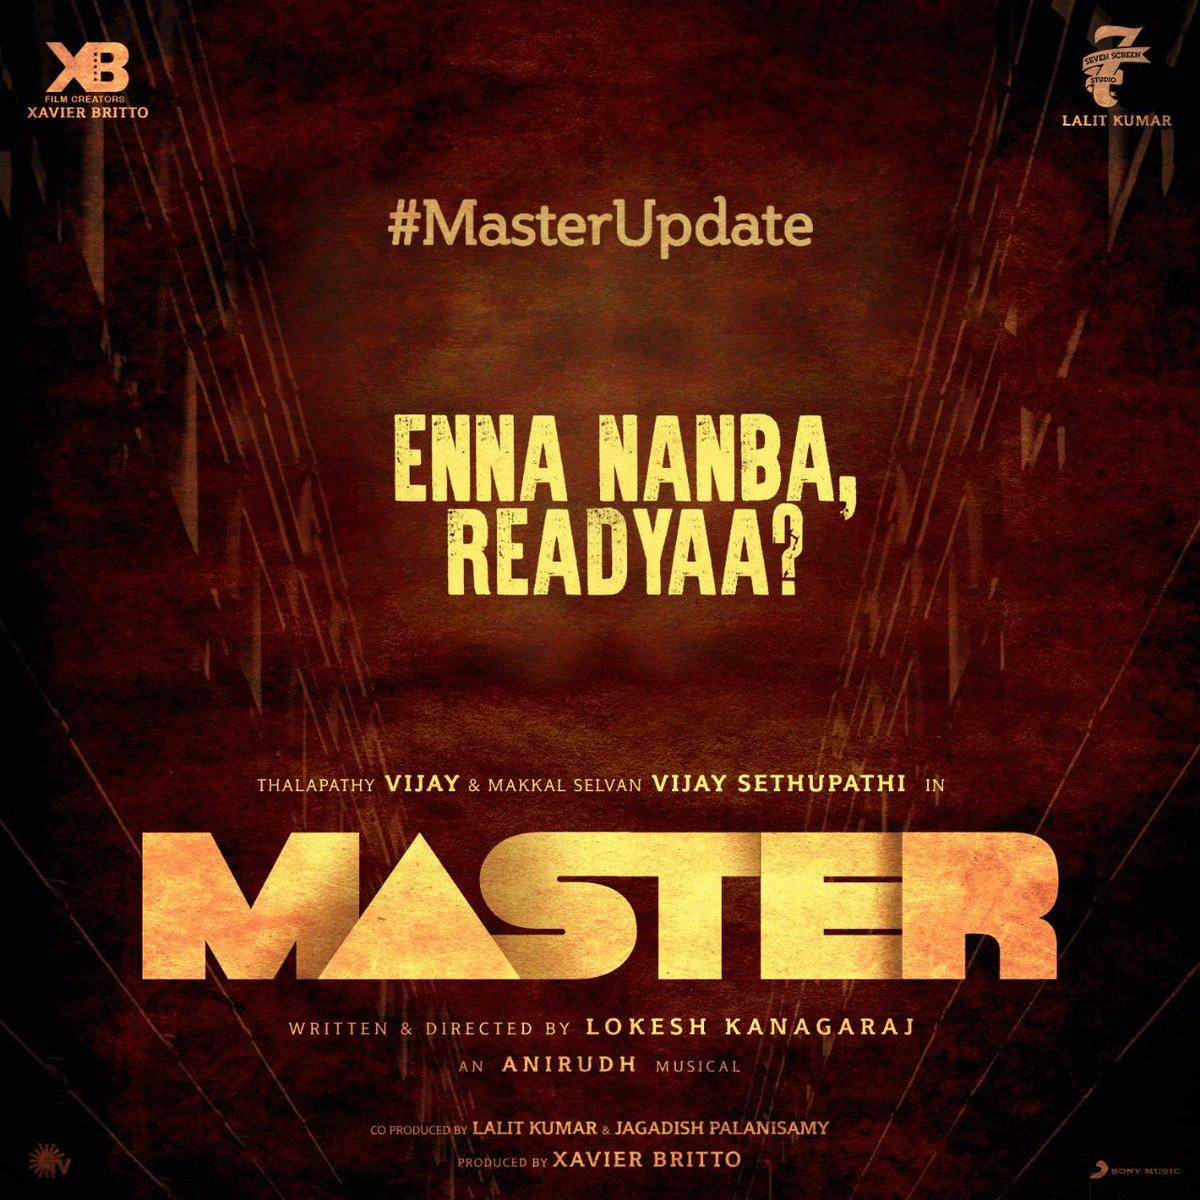 Nanbaa, Namma aataththa aarambichuralama? 😉 Exciting updates on the way!  Keep guessing.  #MasterUpdate @actorvijay @VijaySethuOffl @Dir_Lokesh  @anirudhofficial @jagadishbliss @Lalit_sevenscr @imKBRshanthnu @MalavikaM_ @andrea_jeremiah @gopiprasannaa